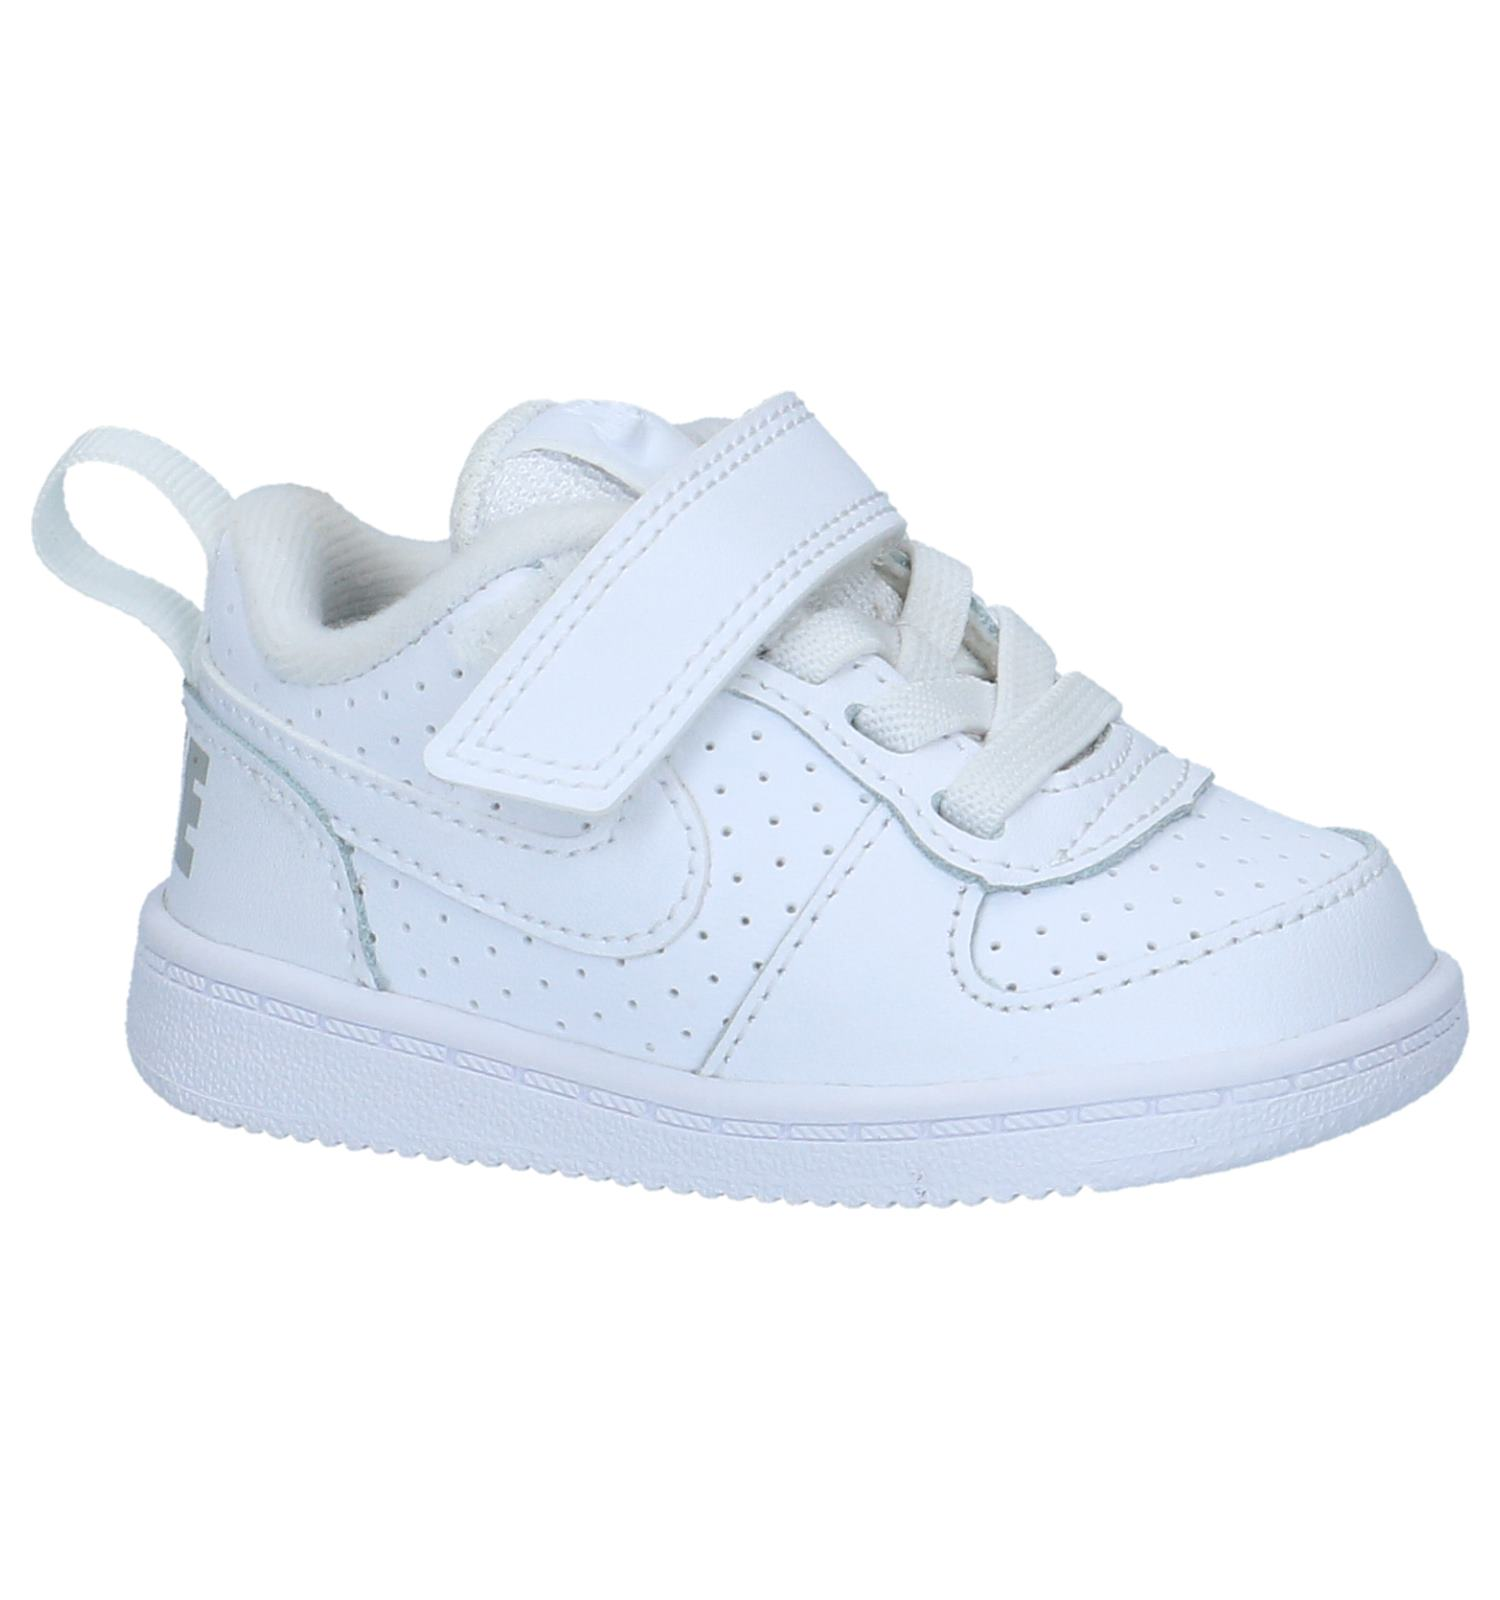 0c8d8b04357 Witte Sneakers Nike Court Borough | TORFS.BE | Gratis verzend en retour